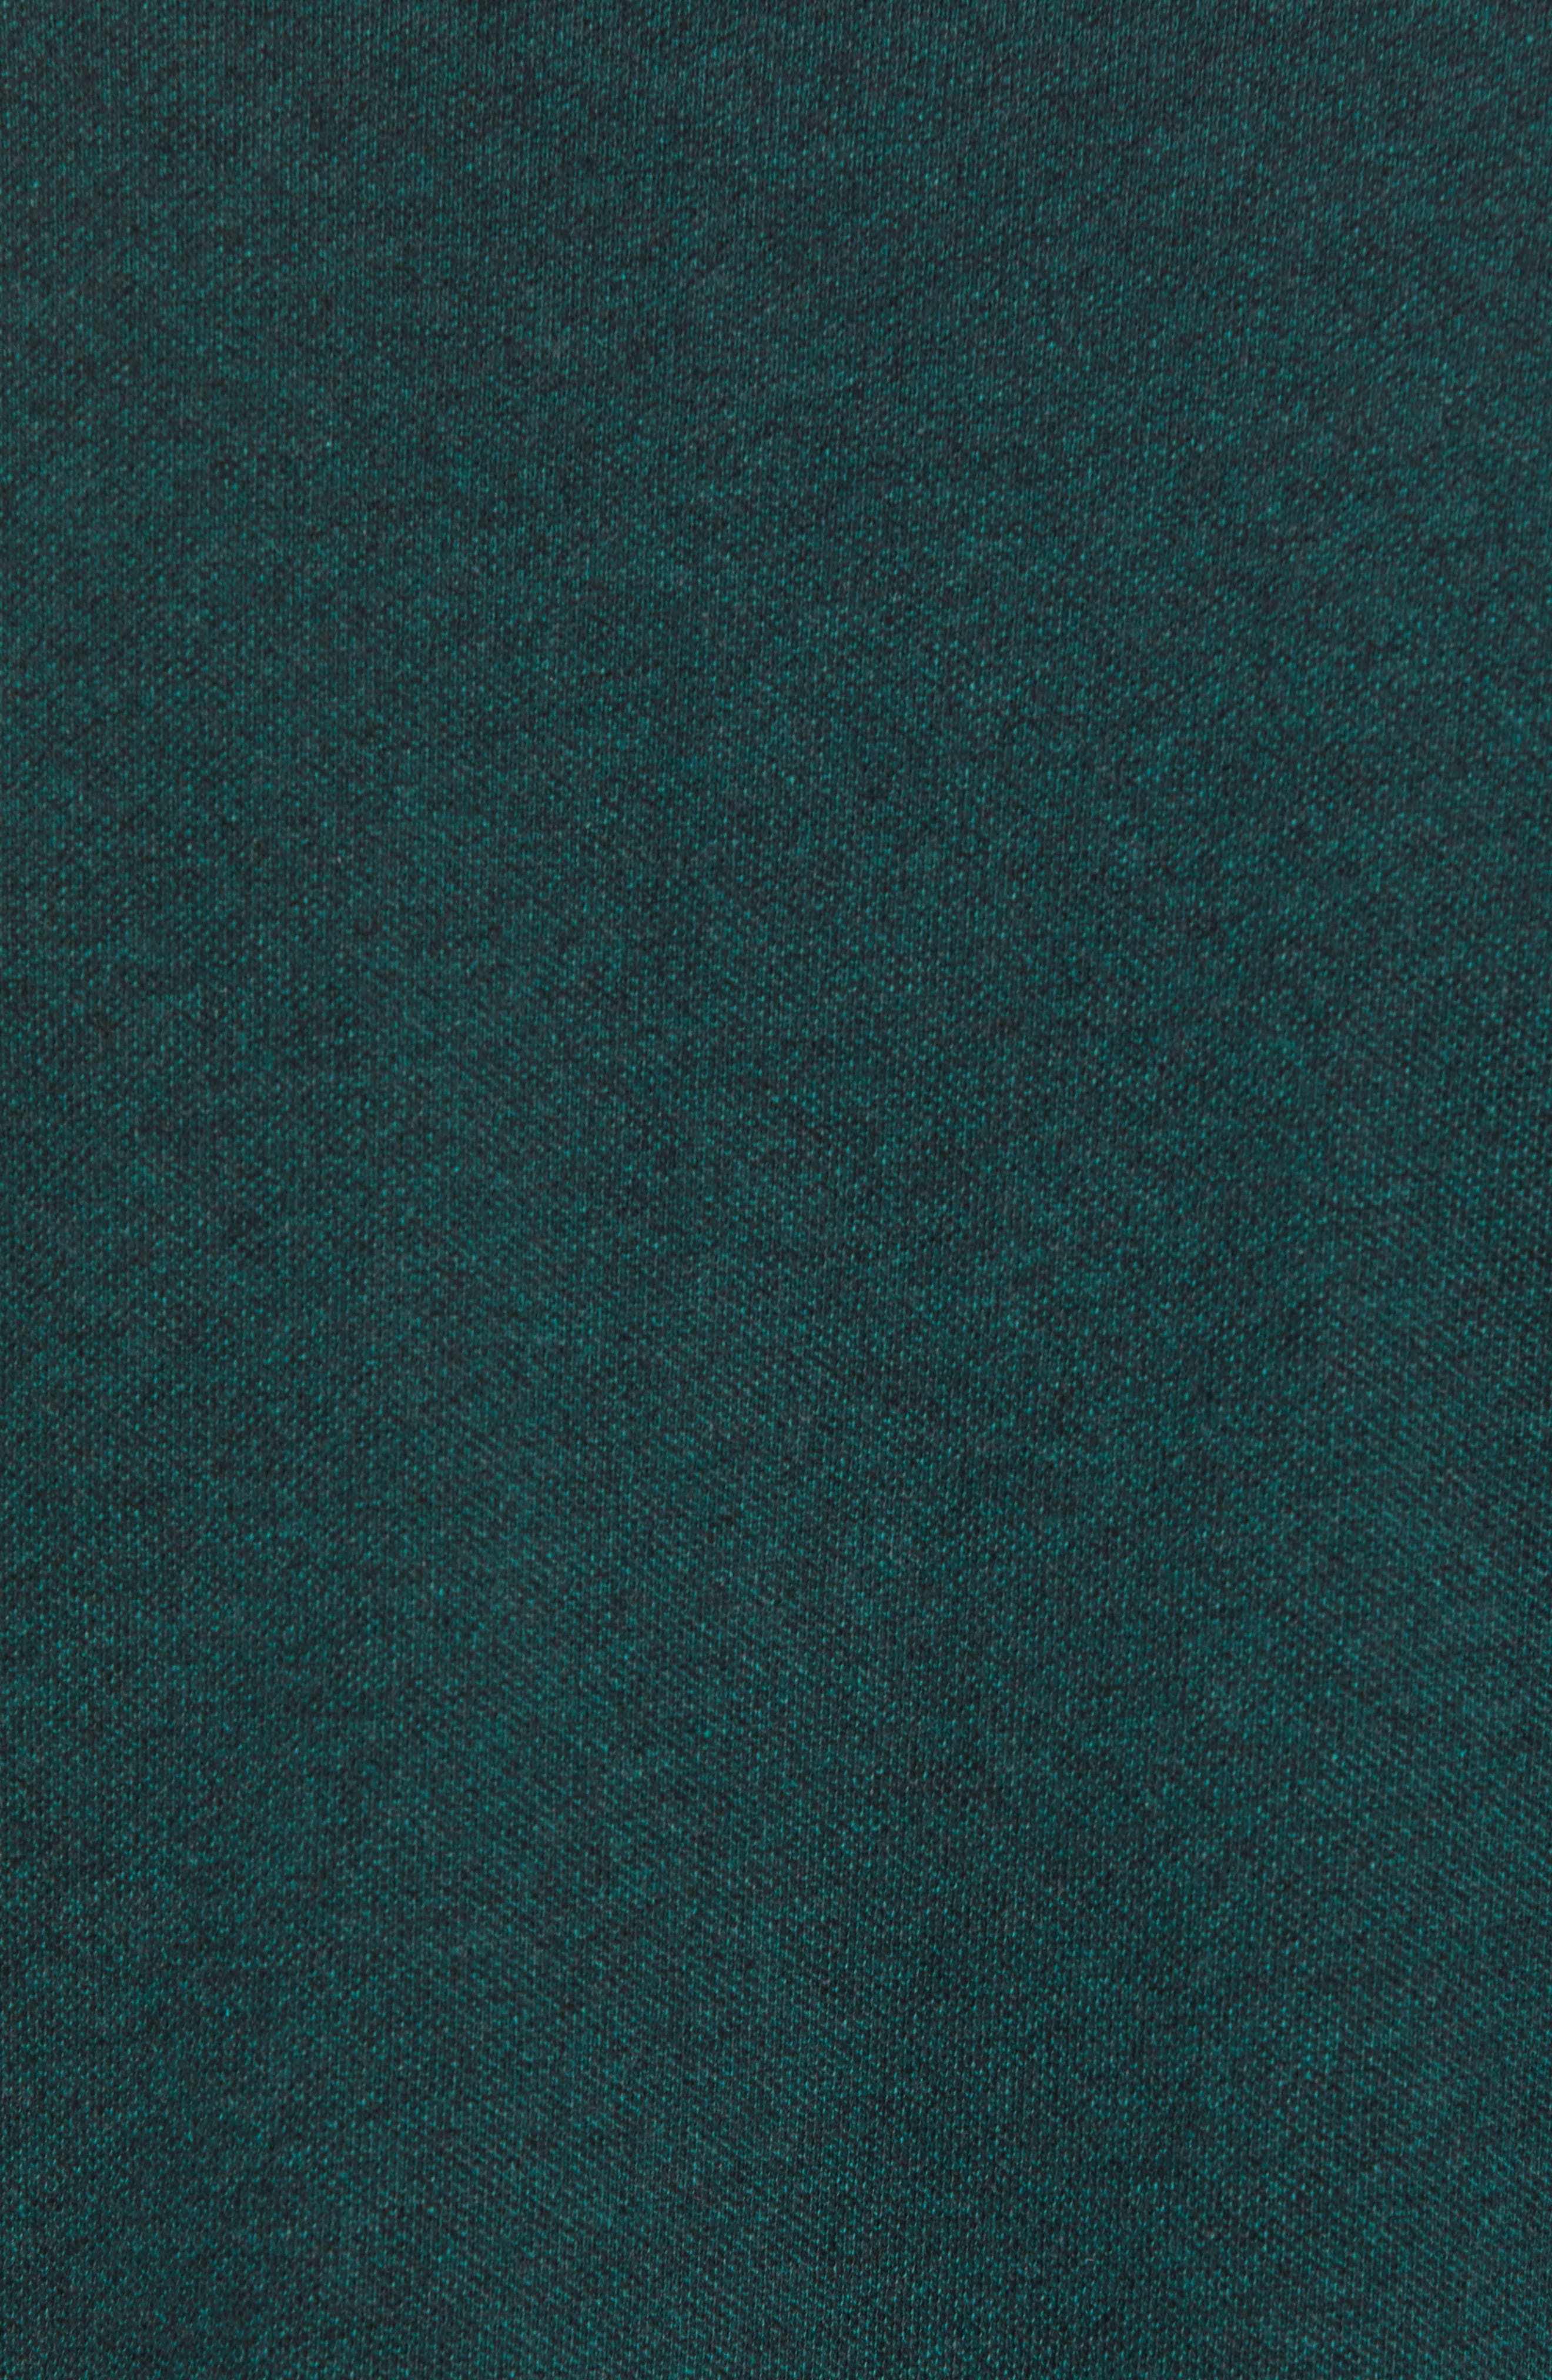 Long Sleeve Piqué Polo,                             Alternate thumbnail 5, color,                             PIN MOULINE